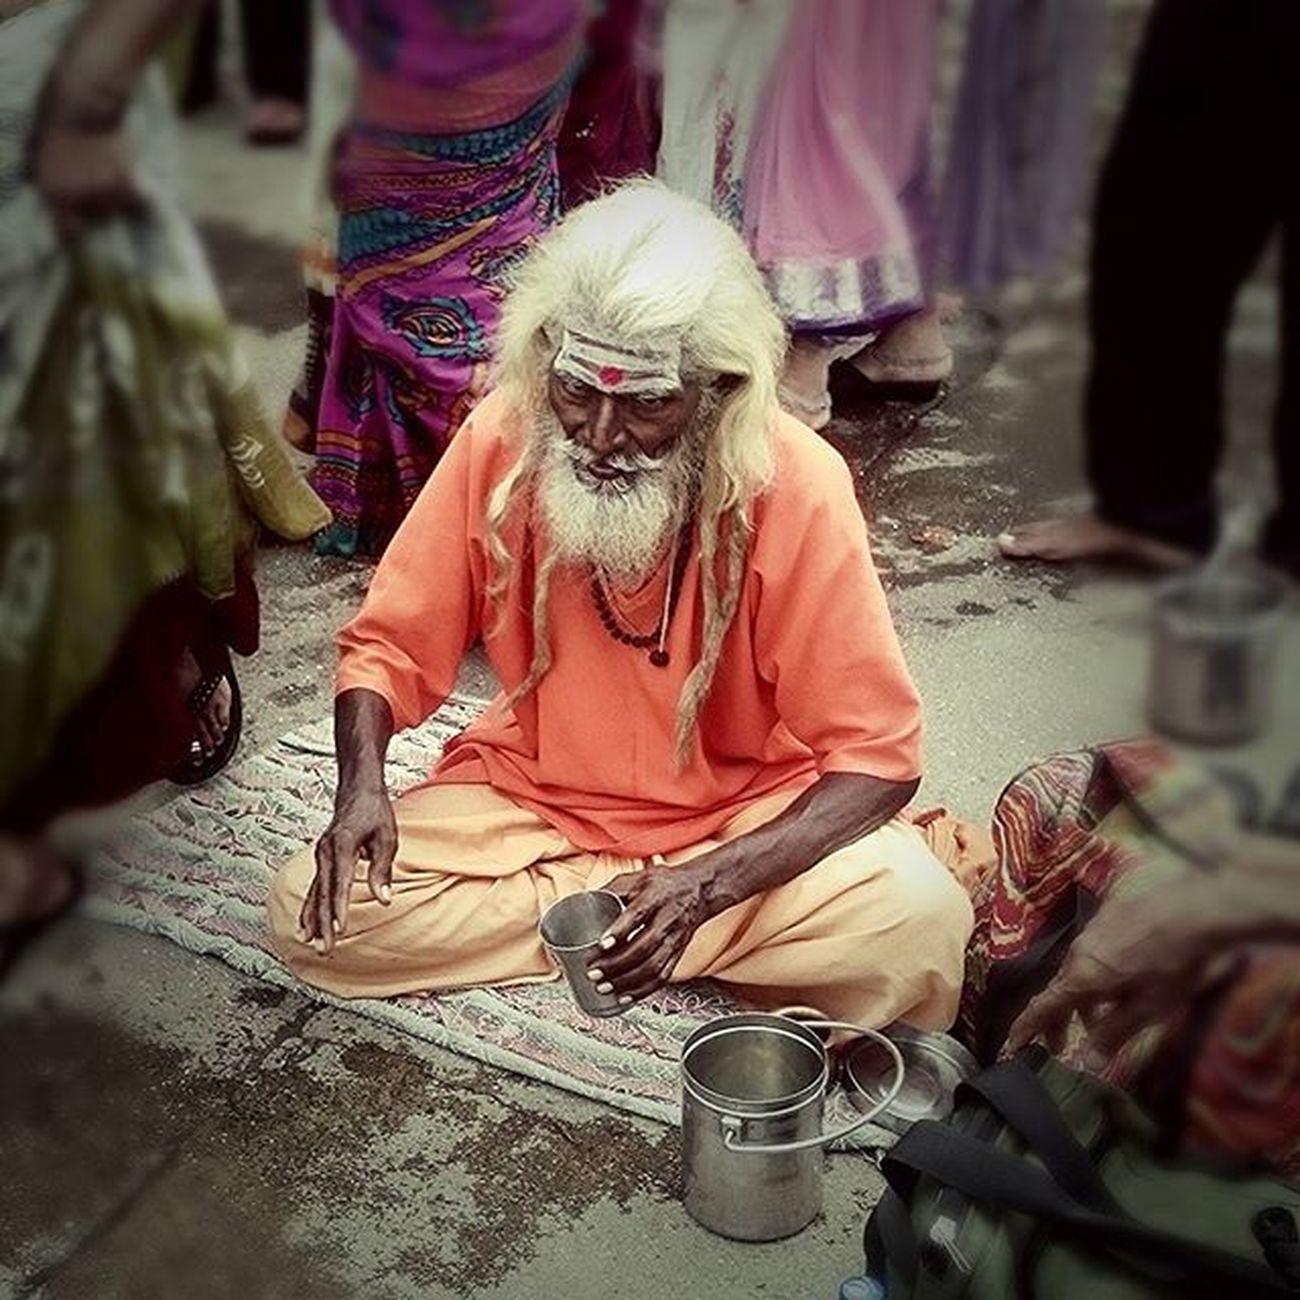 Aghori Mahakumbh Mela Twenty15 RamKund Nasik Sony Instadaily Instapic Dreadsporn